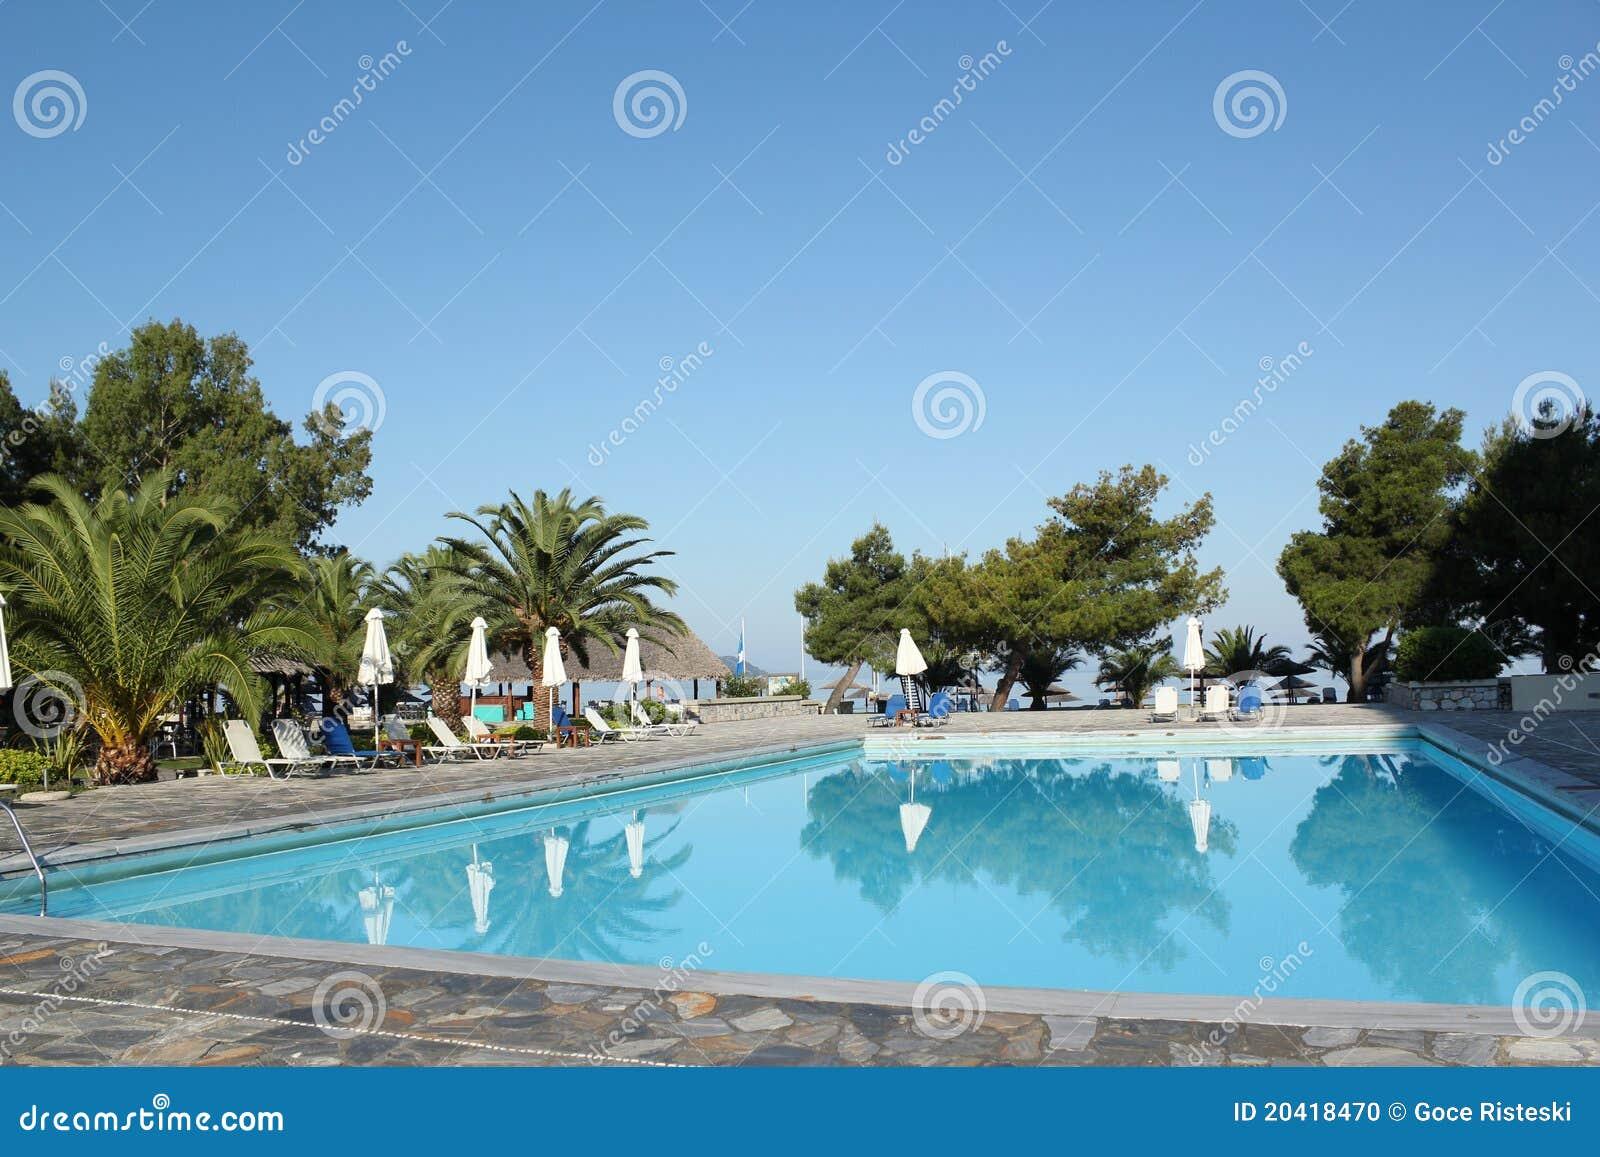 Swimming pool vacation scene stock photo image 20418470 - Swimming pool girl christmas vacation ...